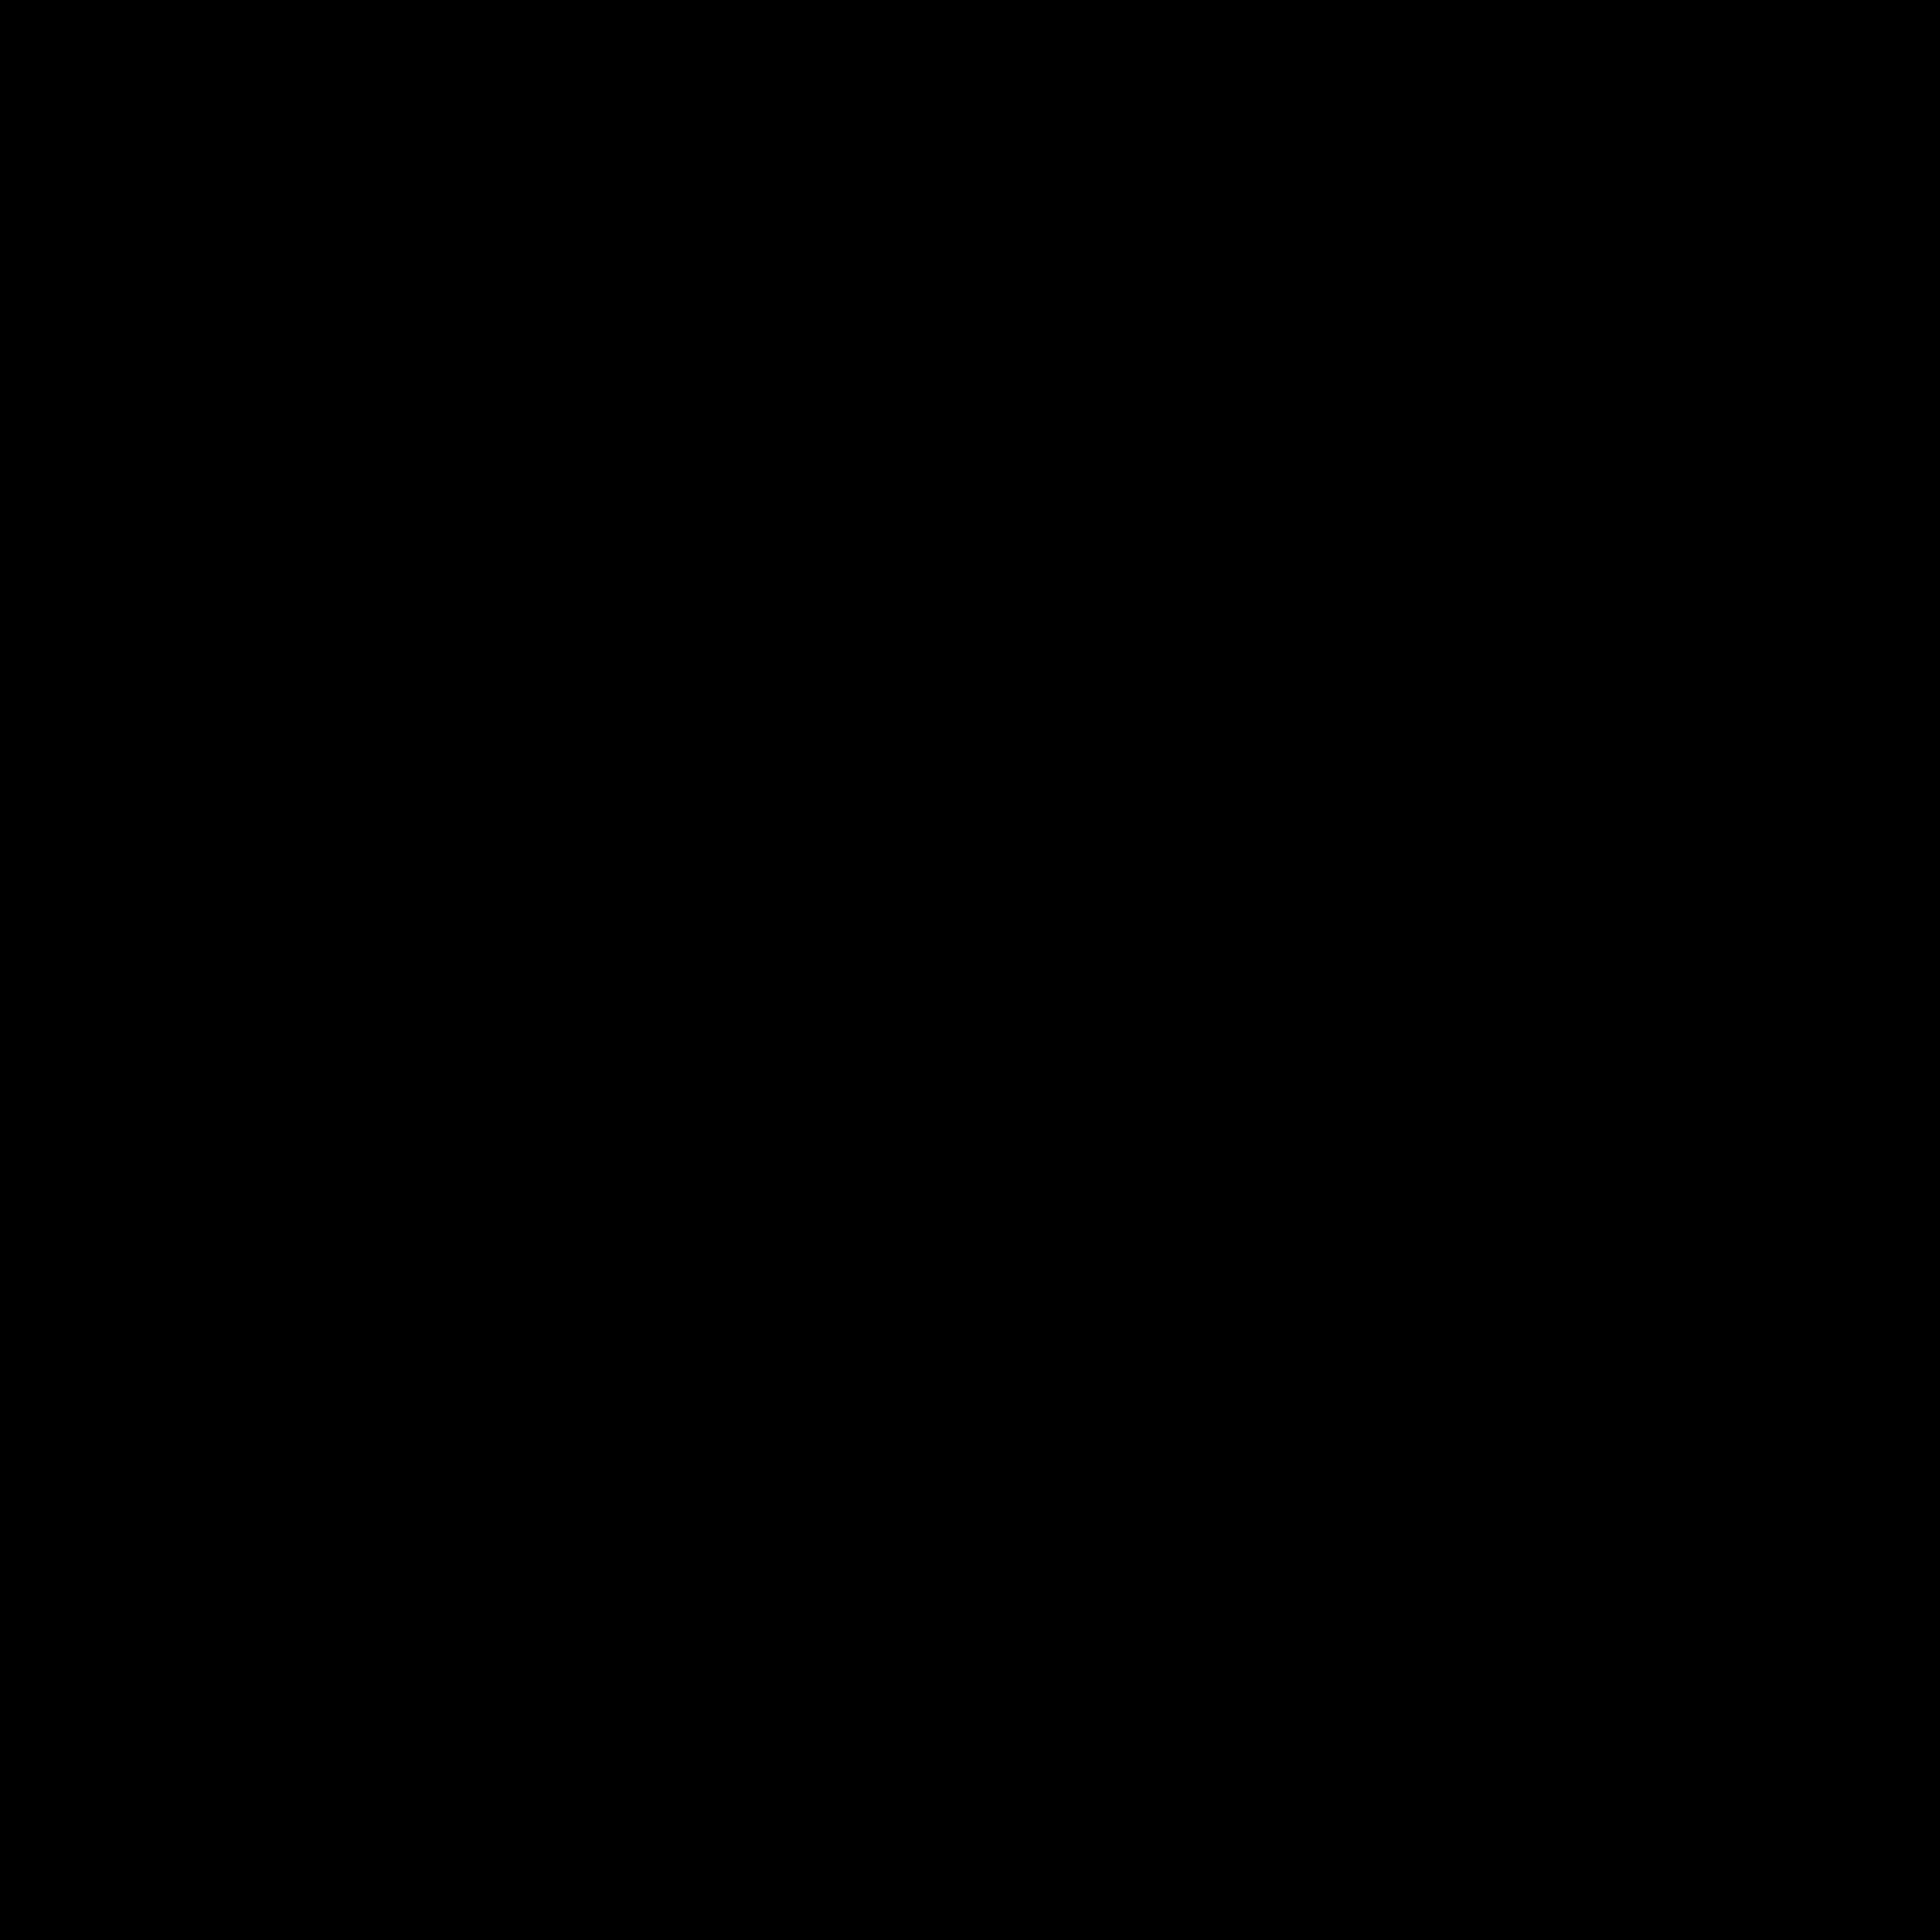 Frontier Logo PNG Transparent & SVG Vector.